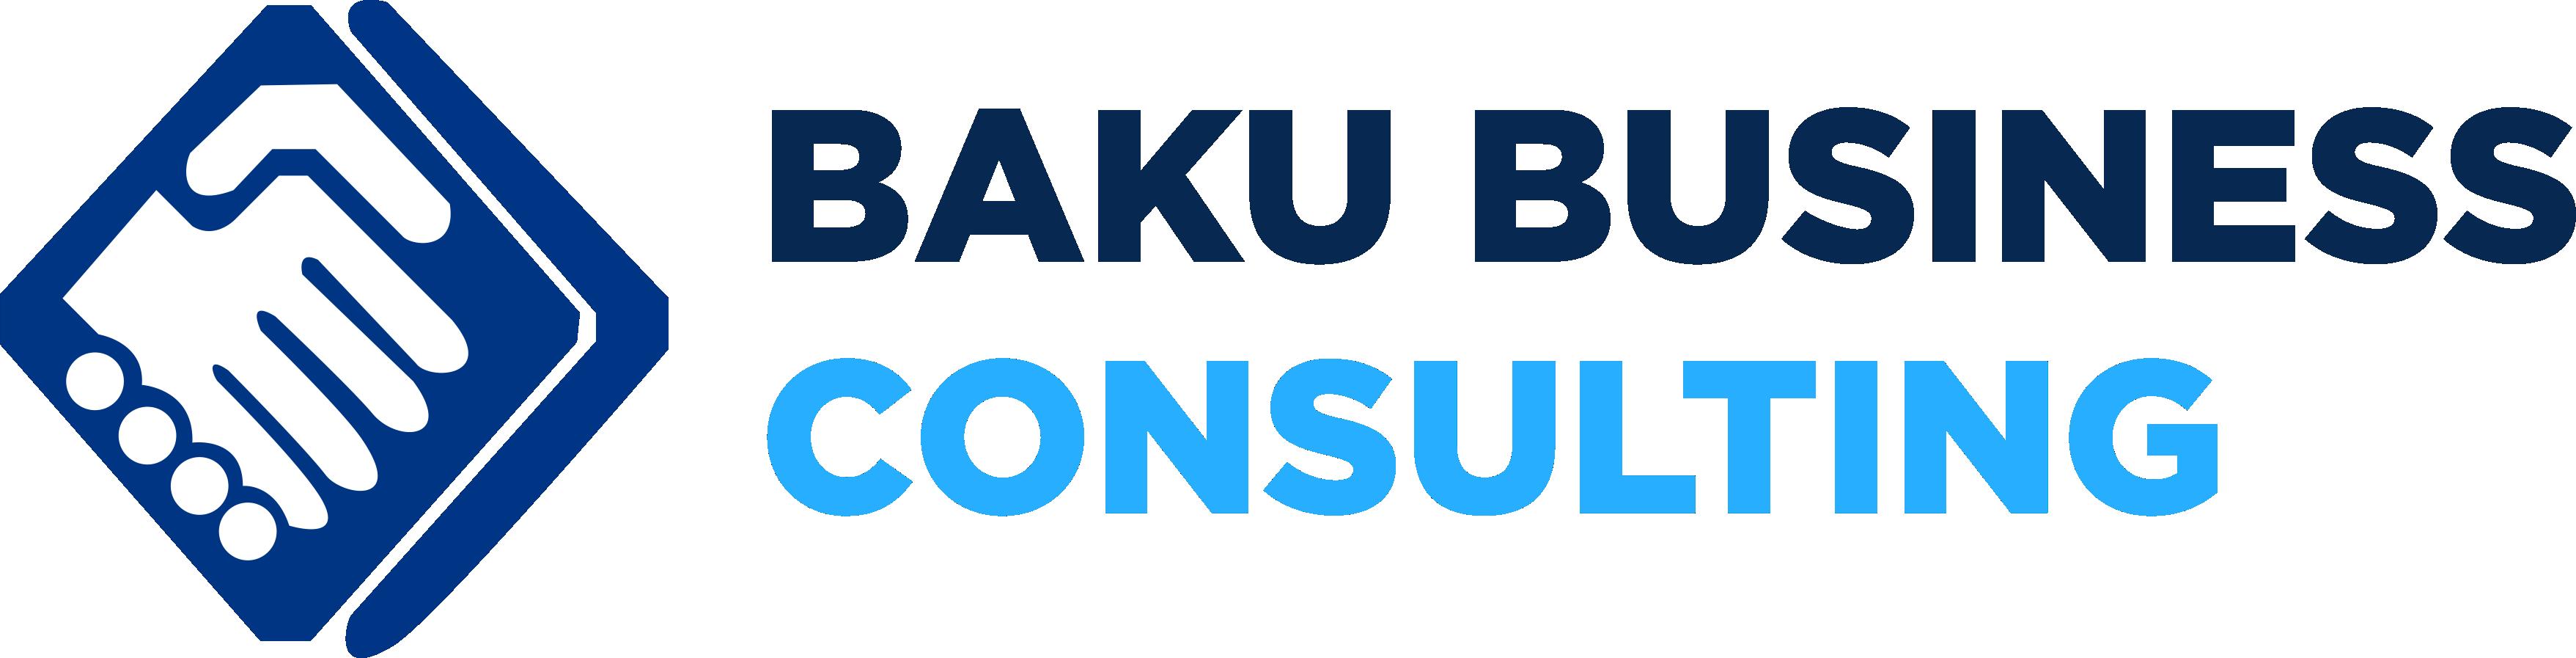 Baku Business Consulting